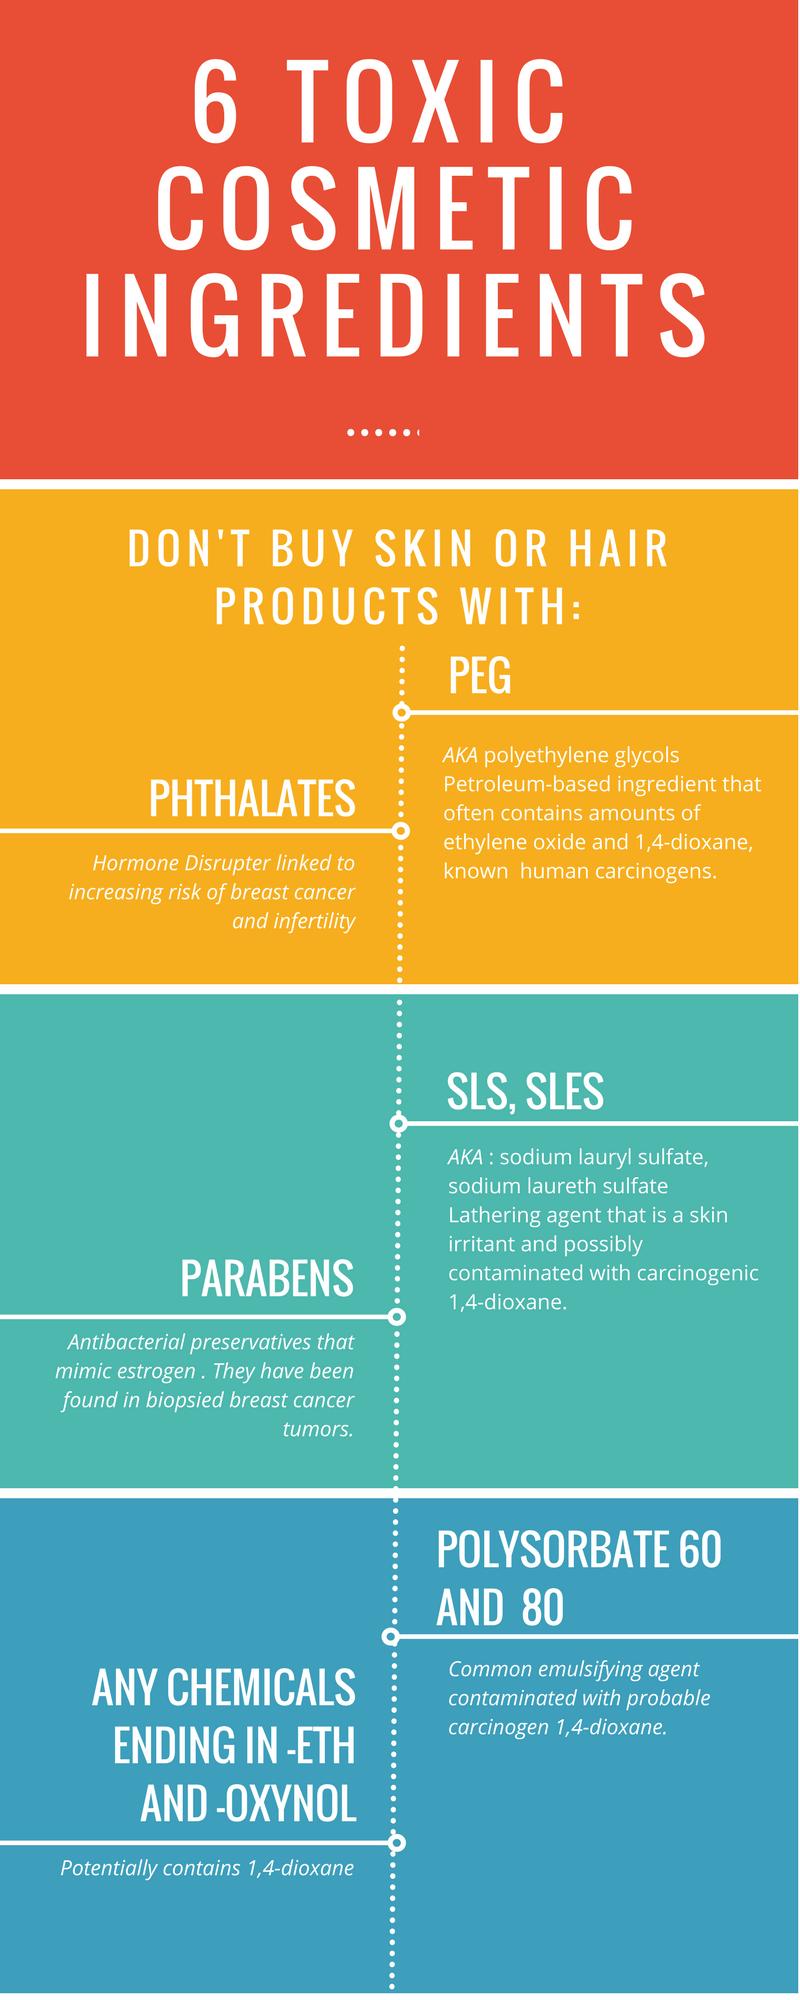 Toxic Cosmetic Toxic Cosmetic Ingredients Cosmetics Ingredients Makeup Ingredients